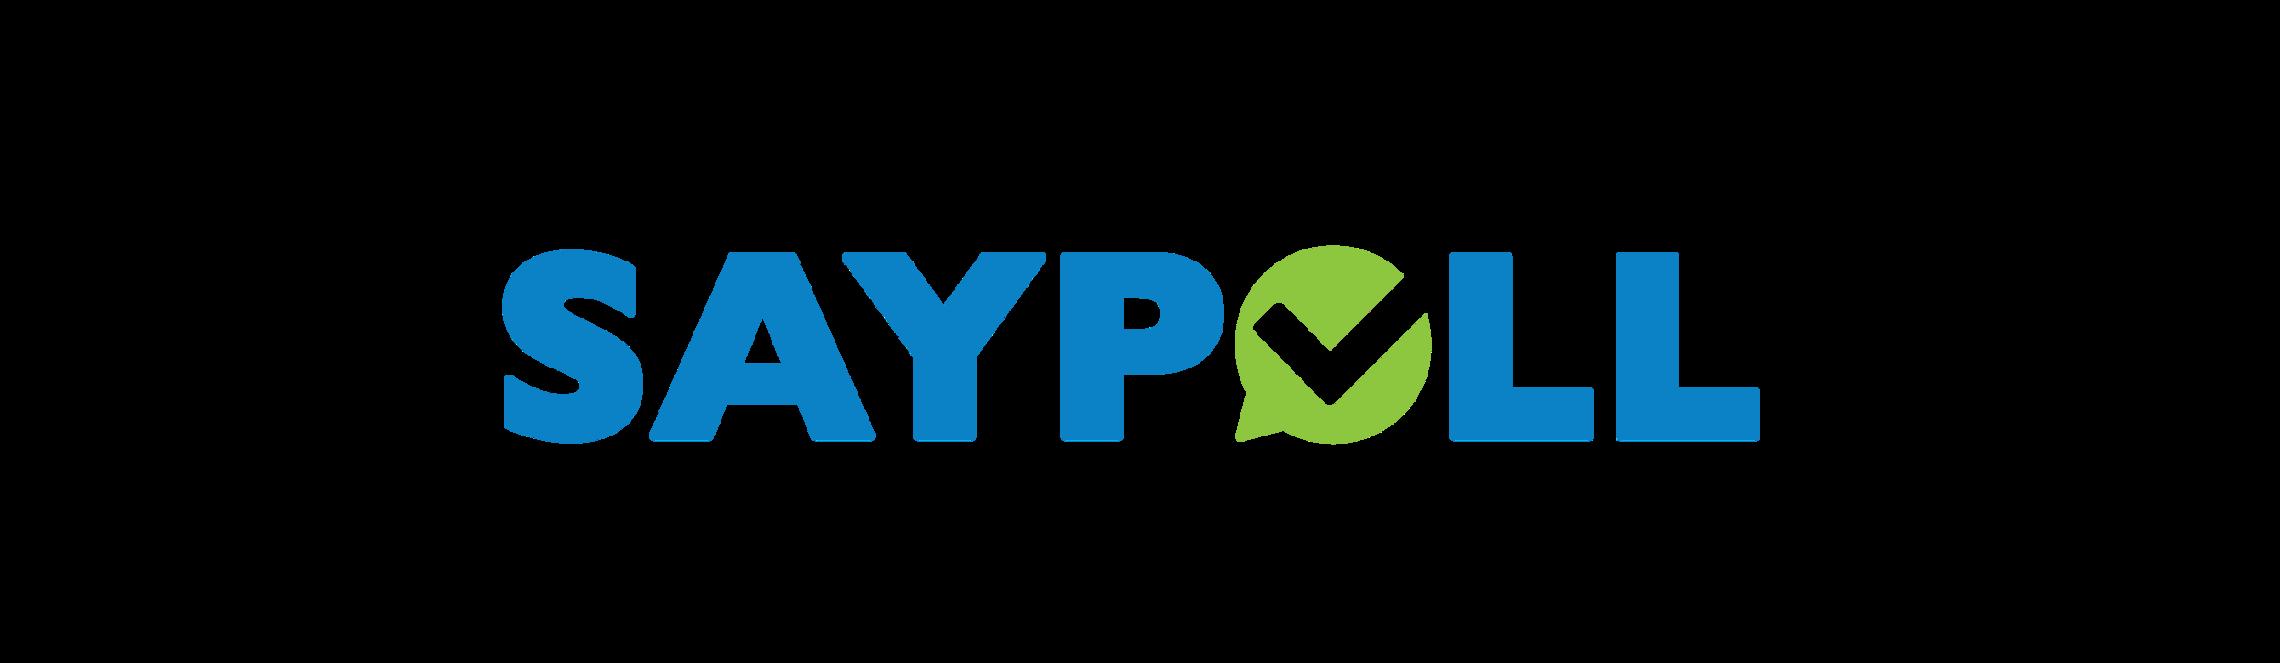 Saypoll